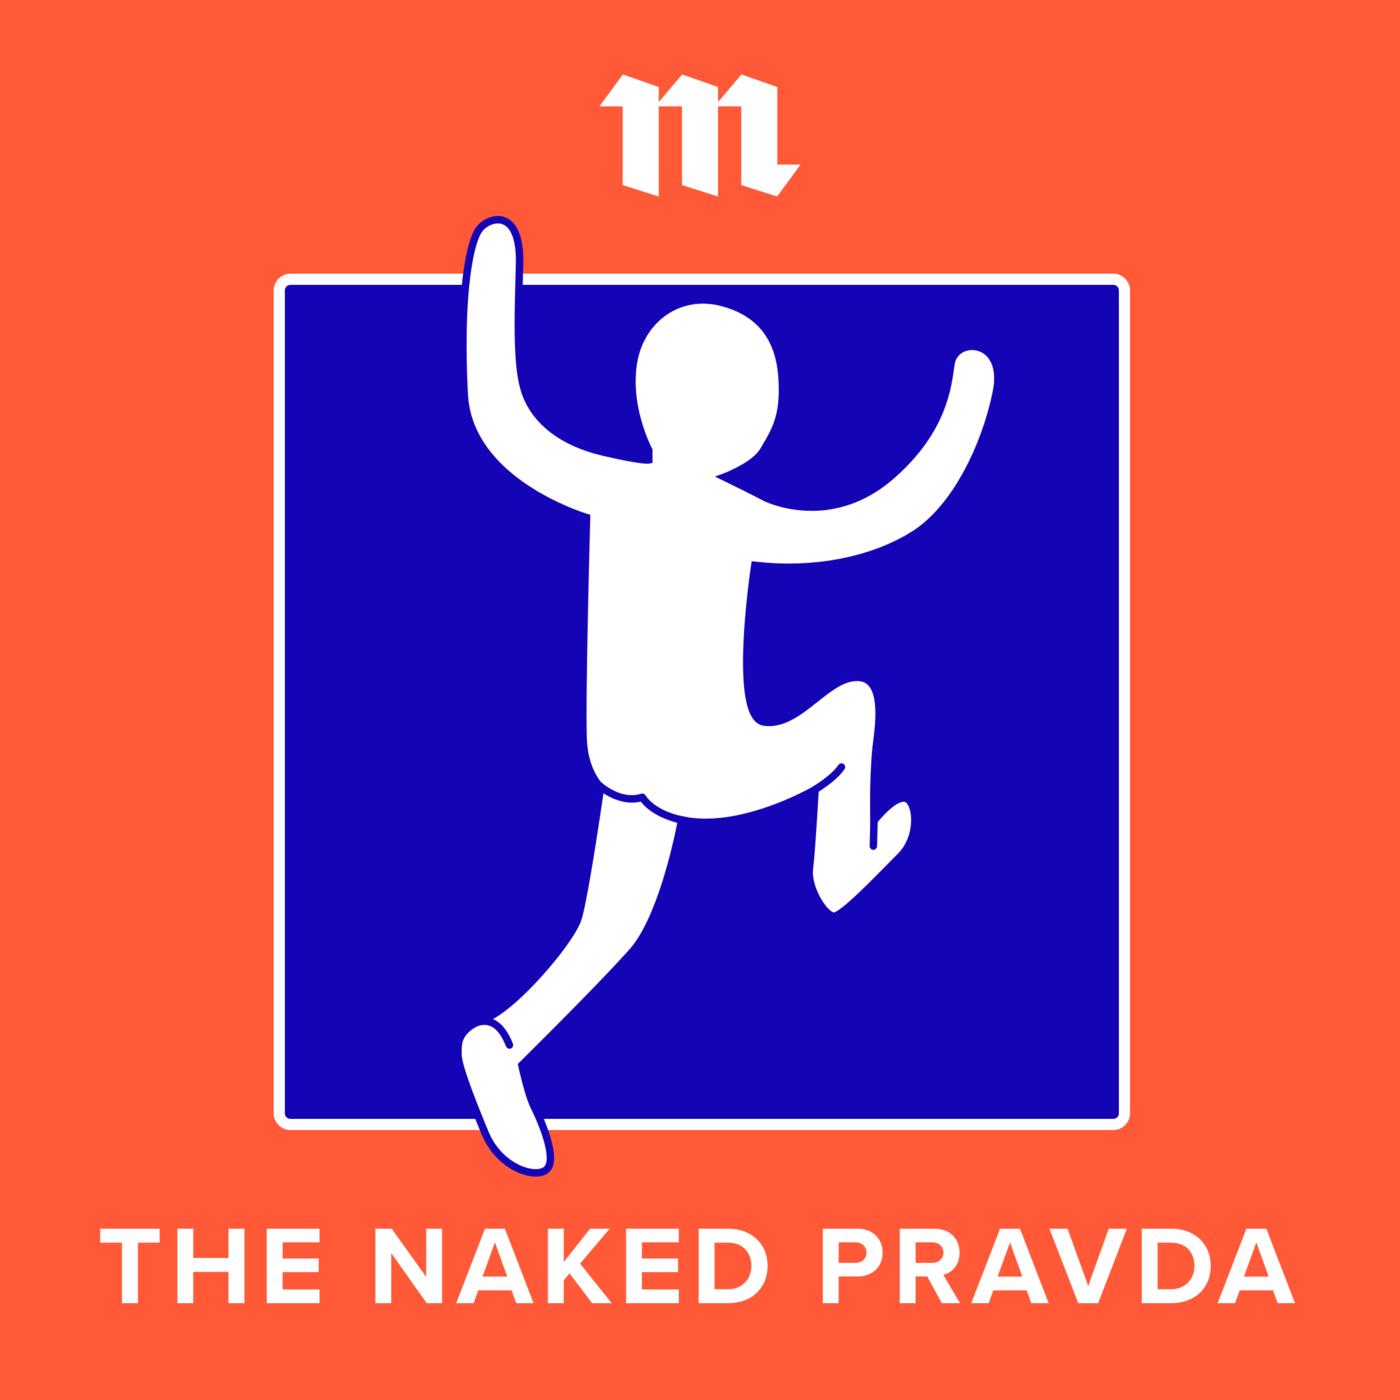 Kevin Rothrock 'The Naked Pravda' premiere trailer: Meduza's new English-language podcast the naked man